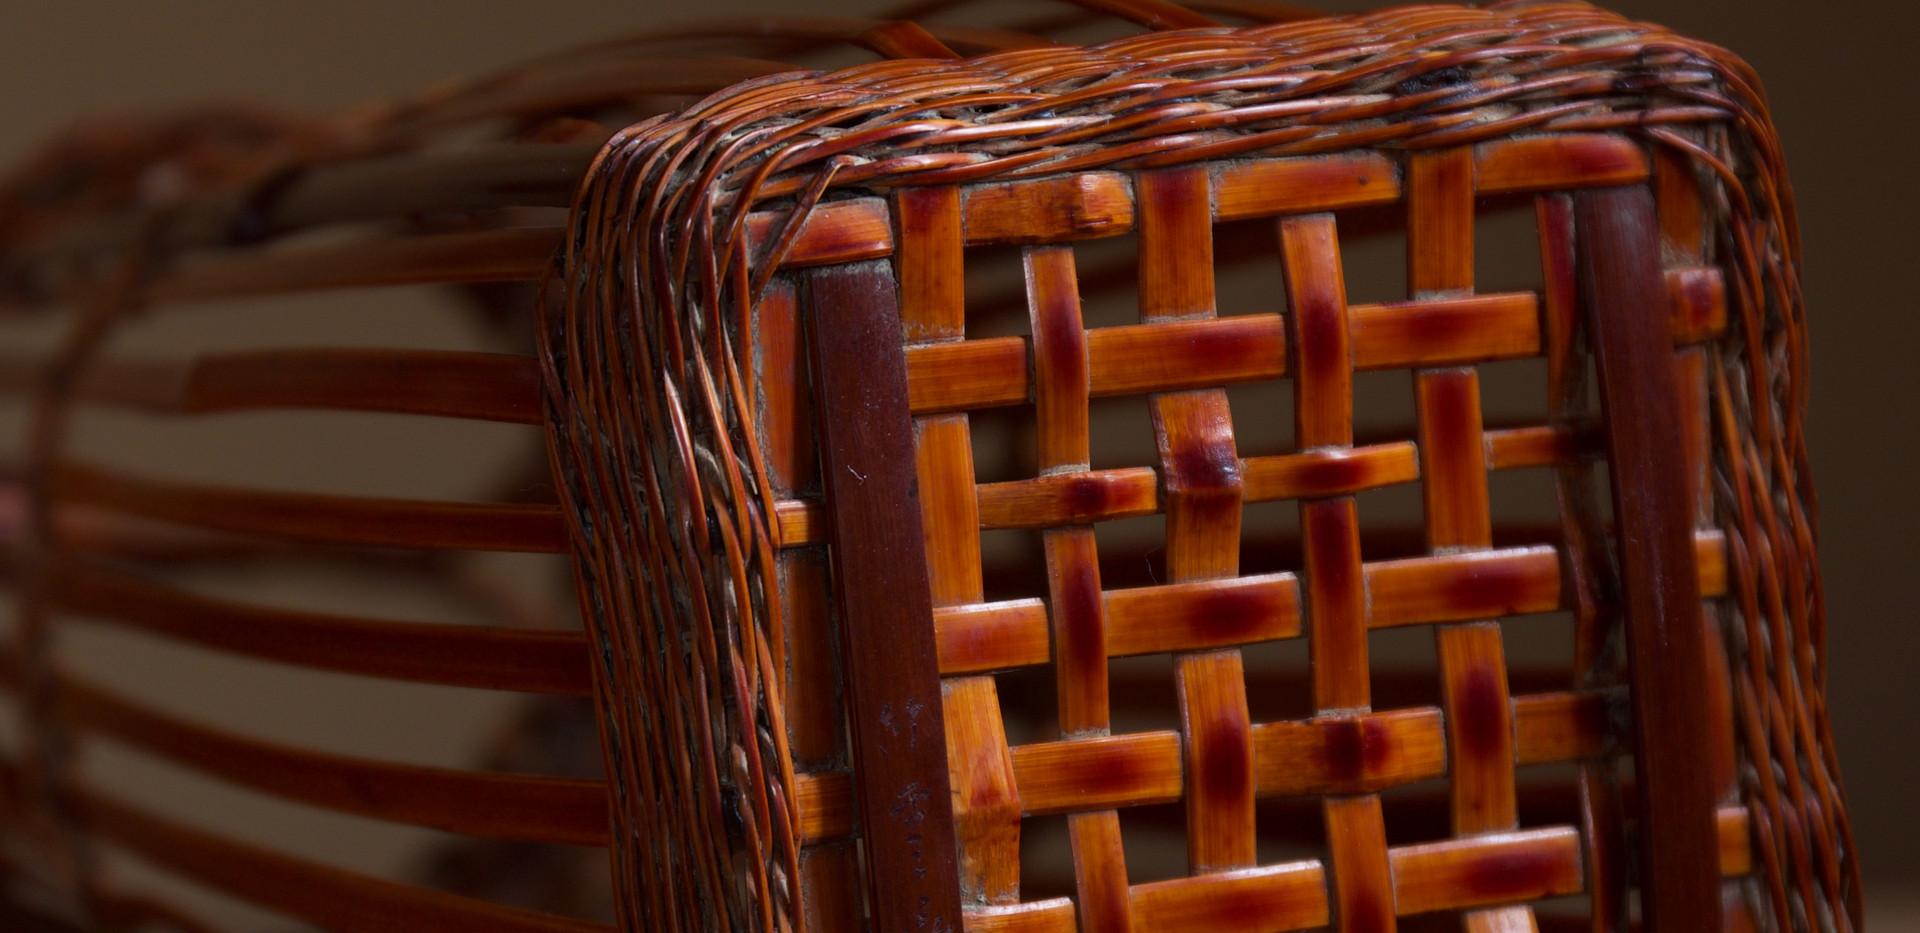 Tanabe Chikuunsai II Bamboo Fence 05.jpg